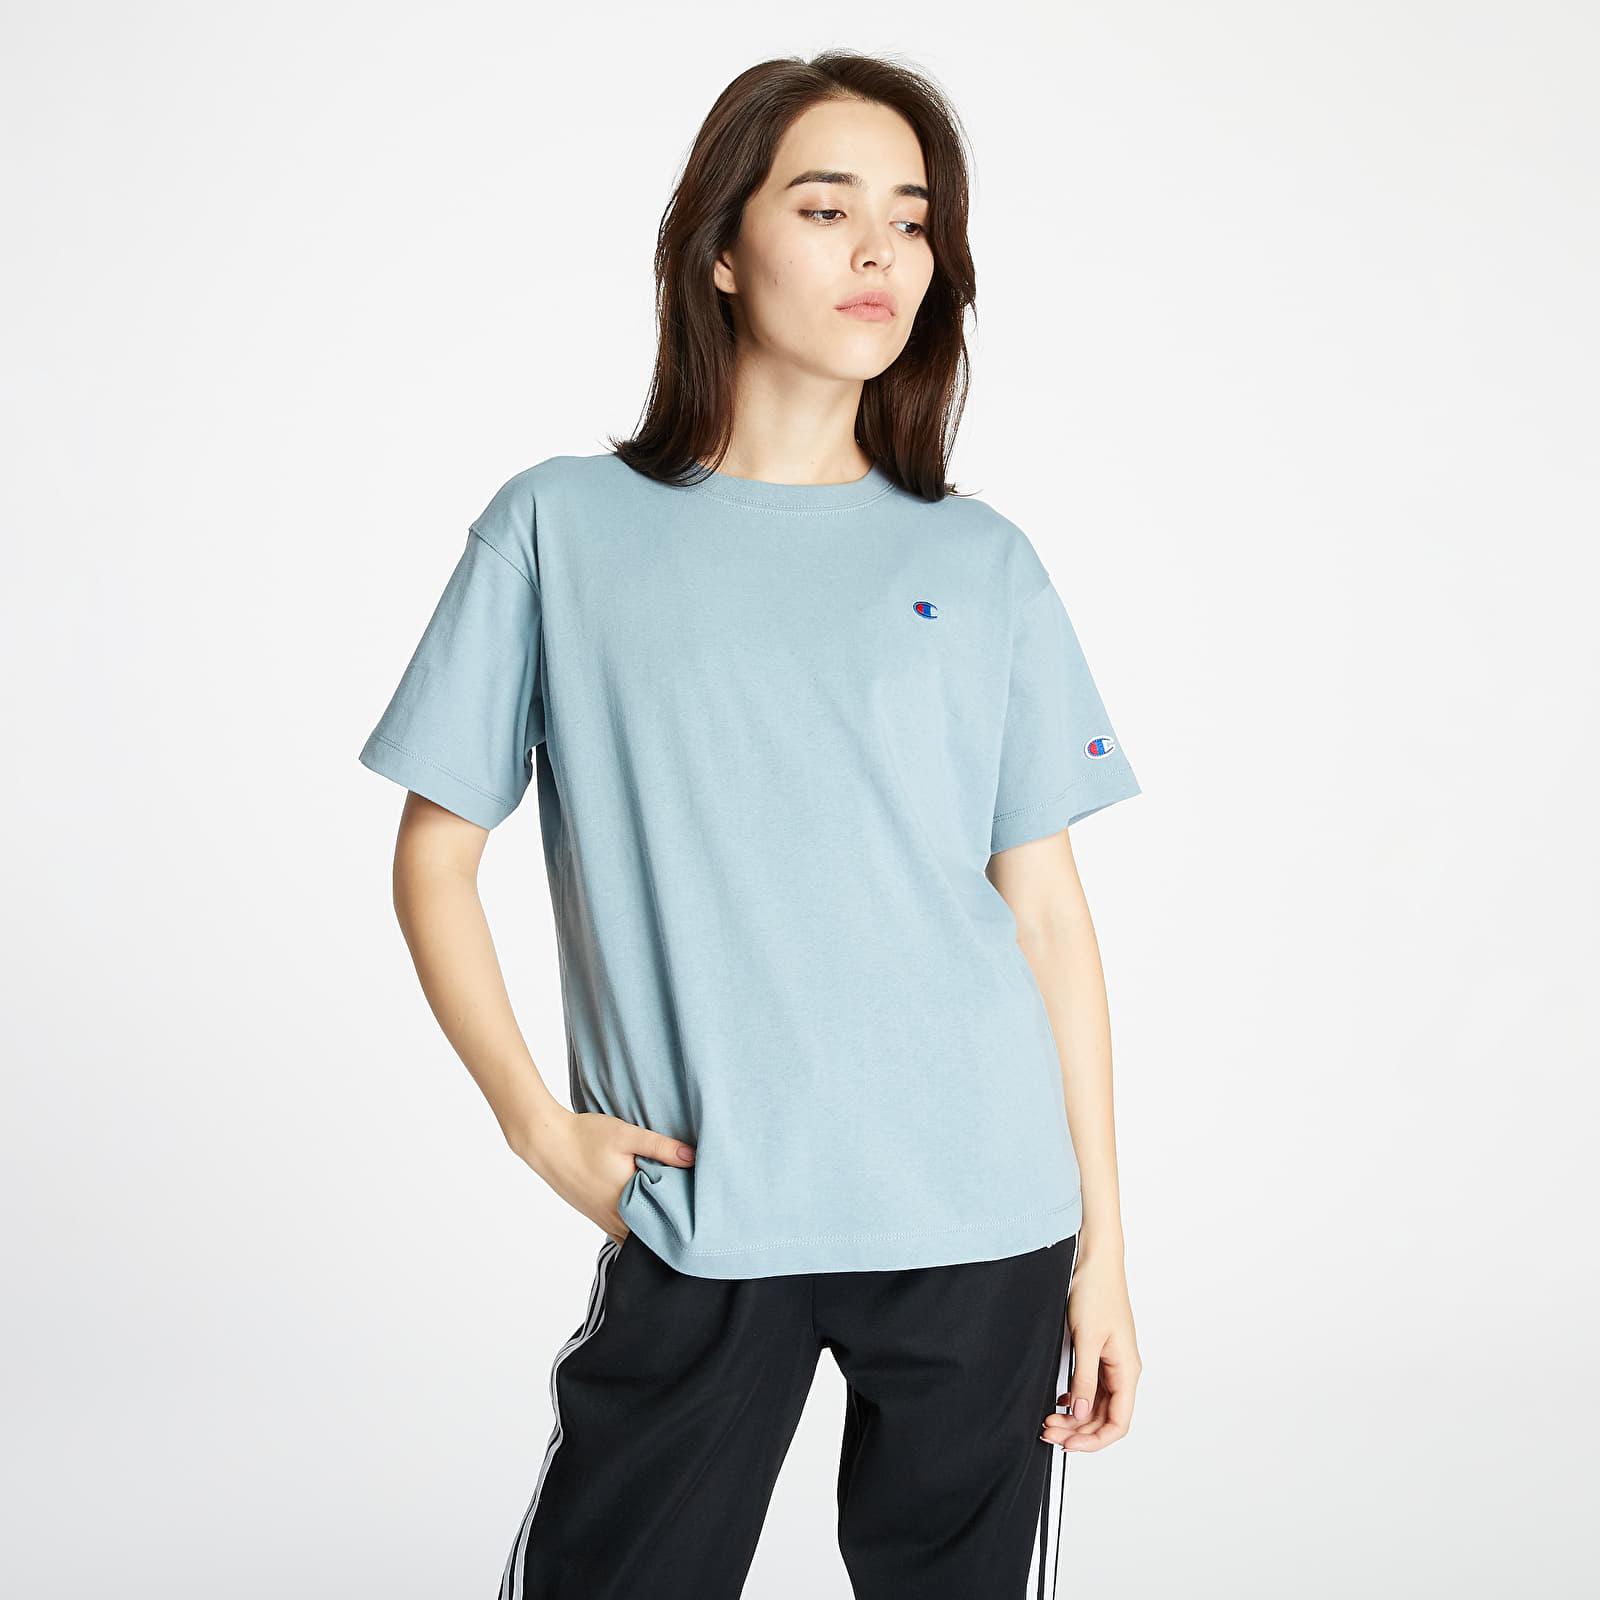 T-shirts Champion Tee Blue